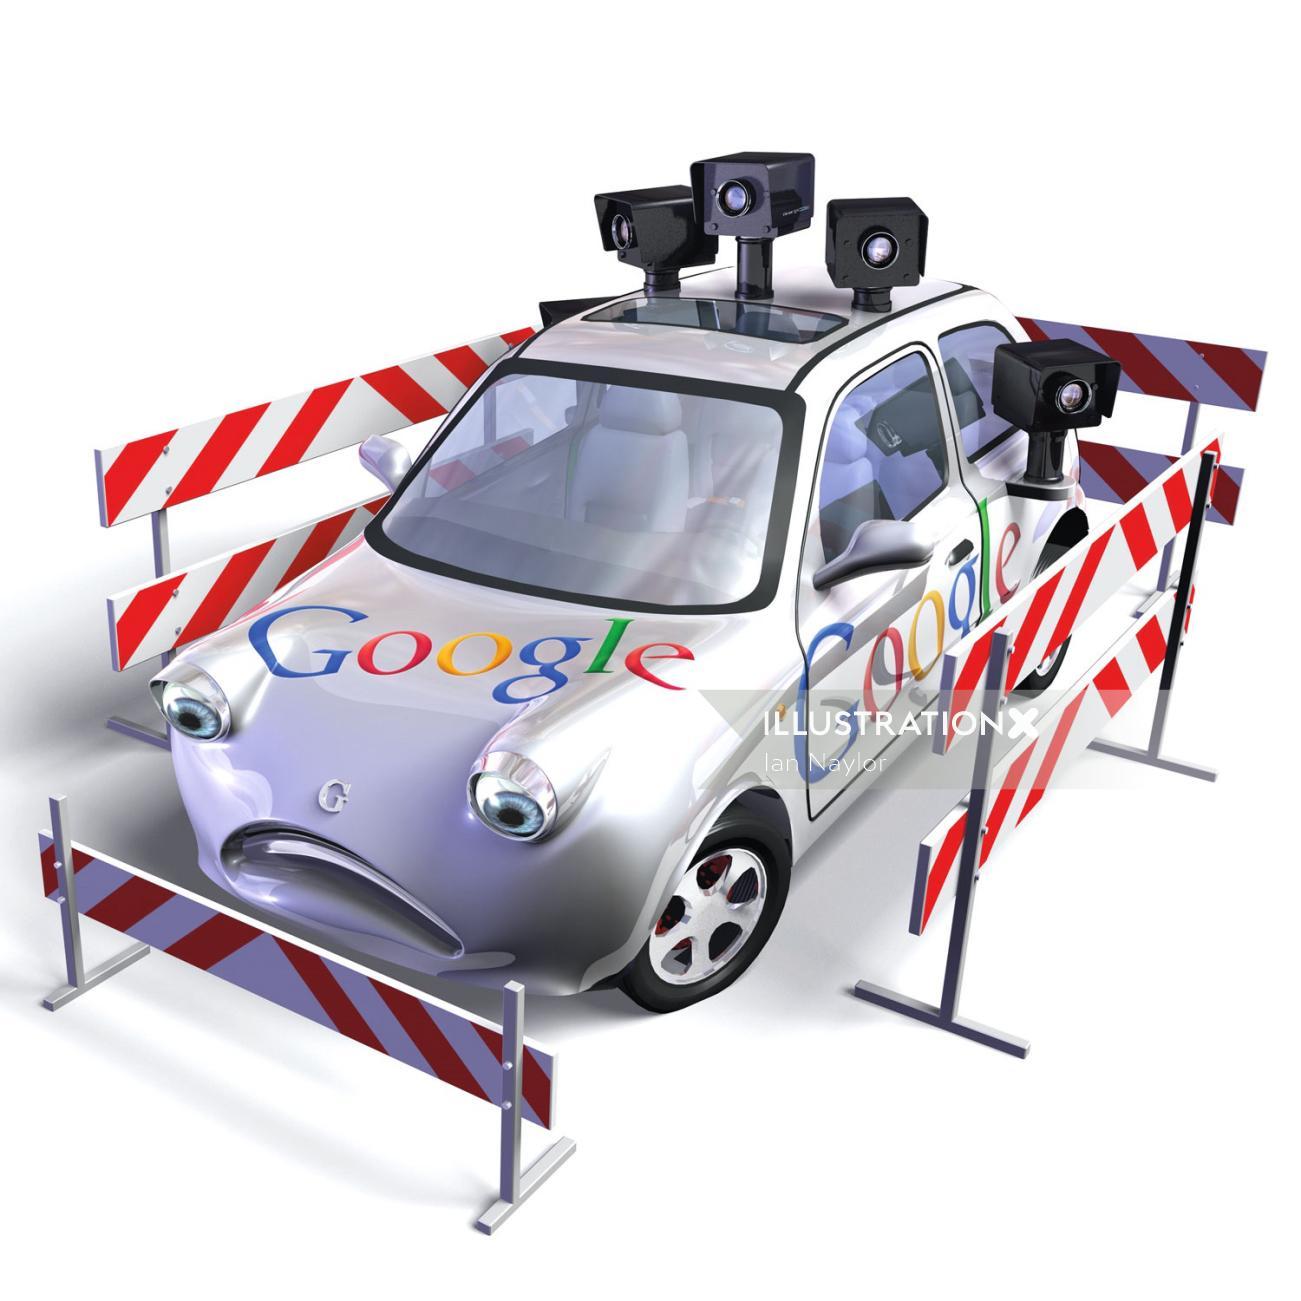 Google Card 3d design